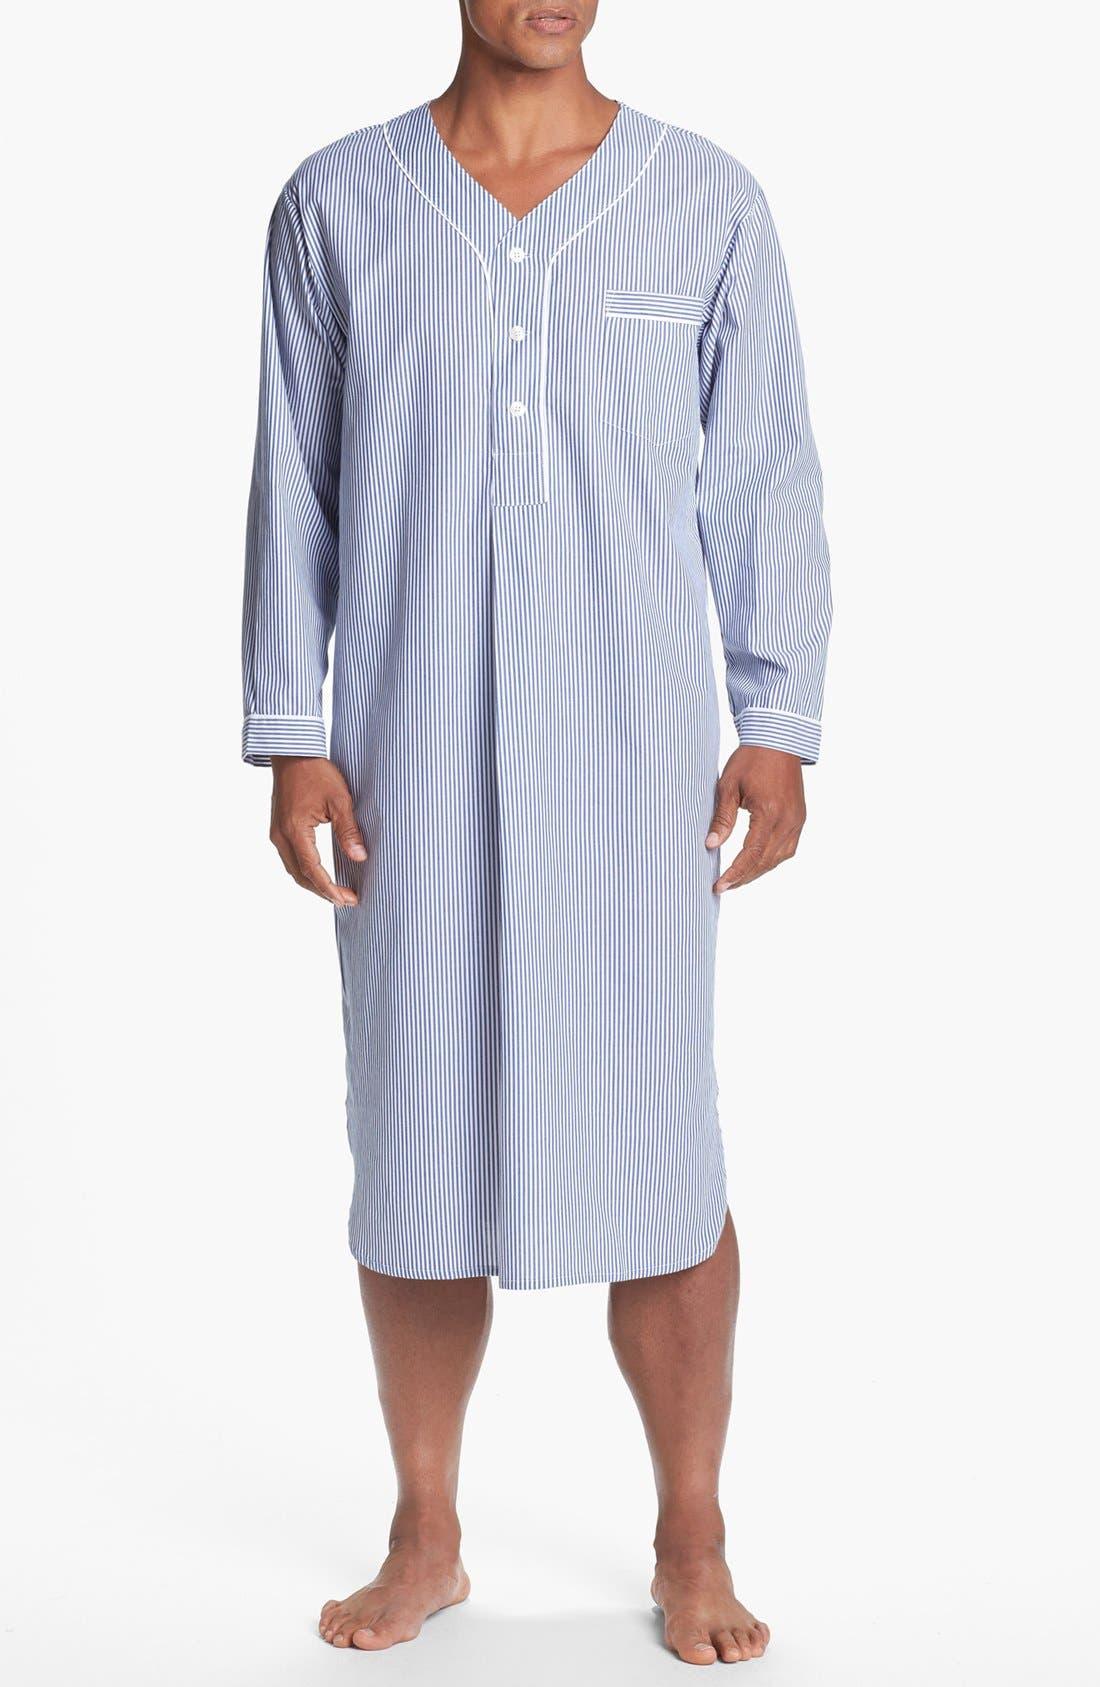 Majestic International Cotton Nightshirt